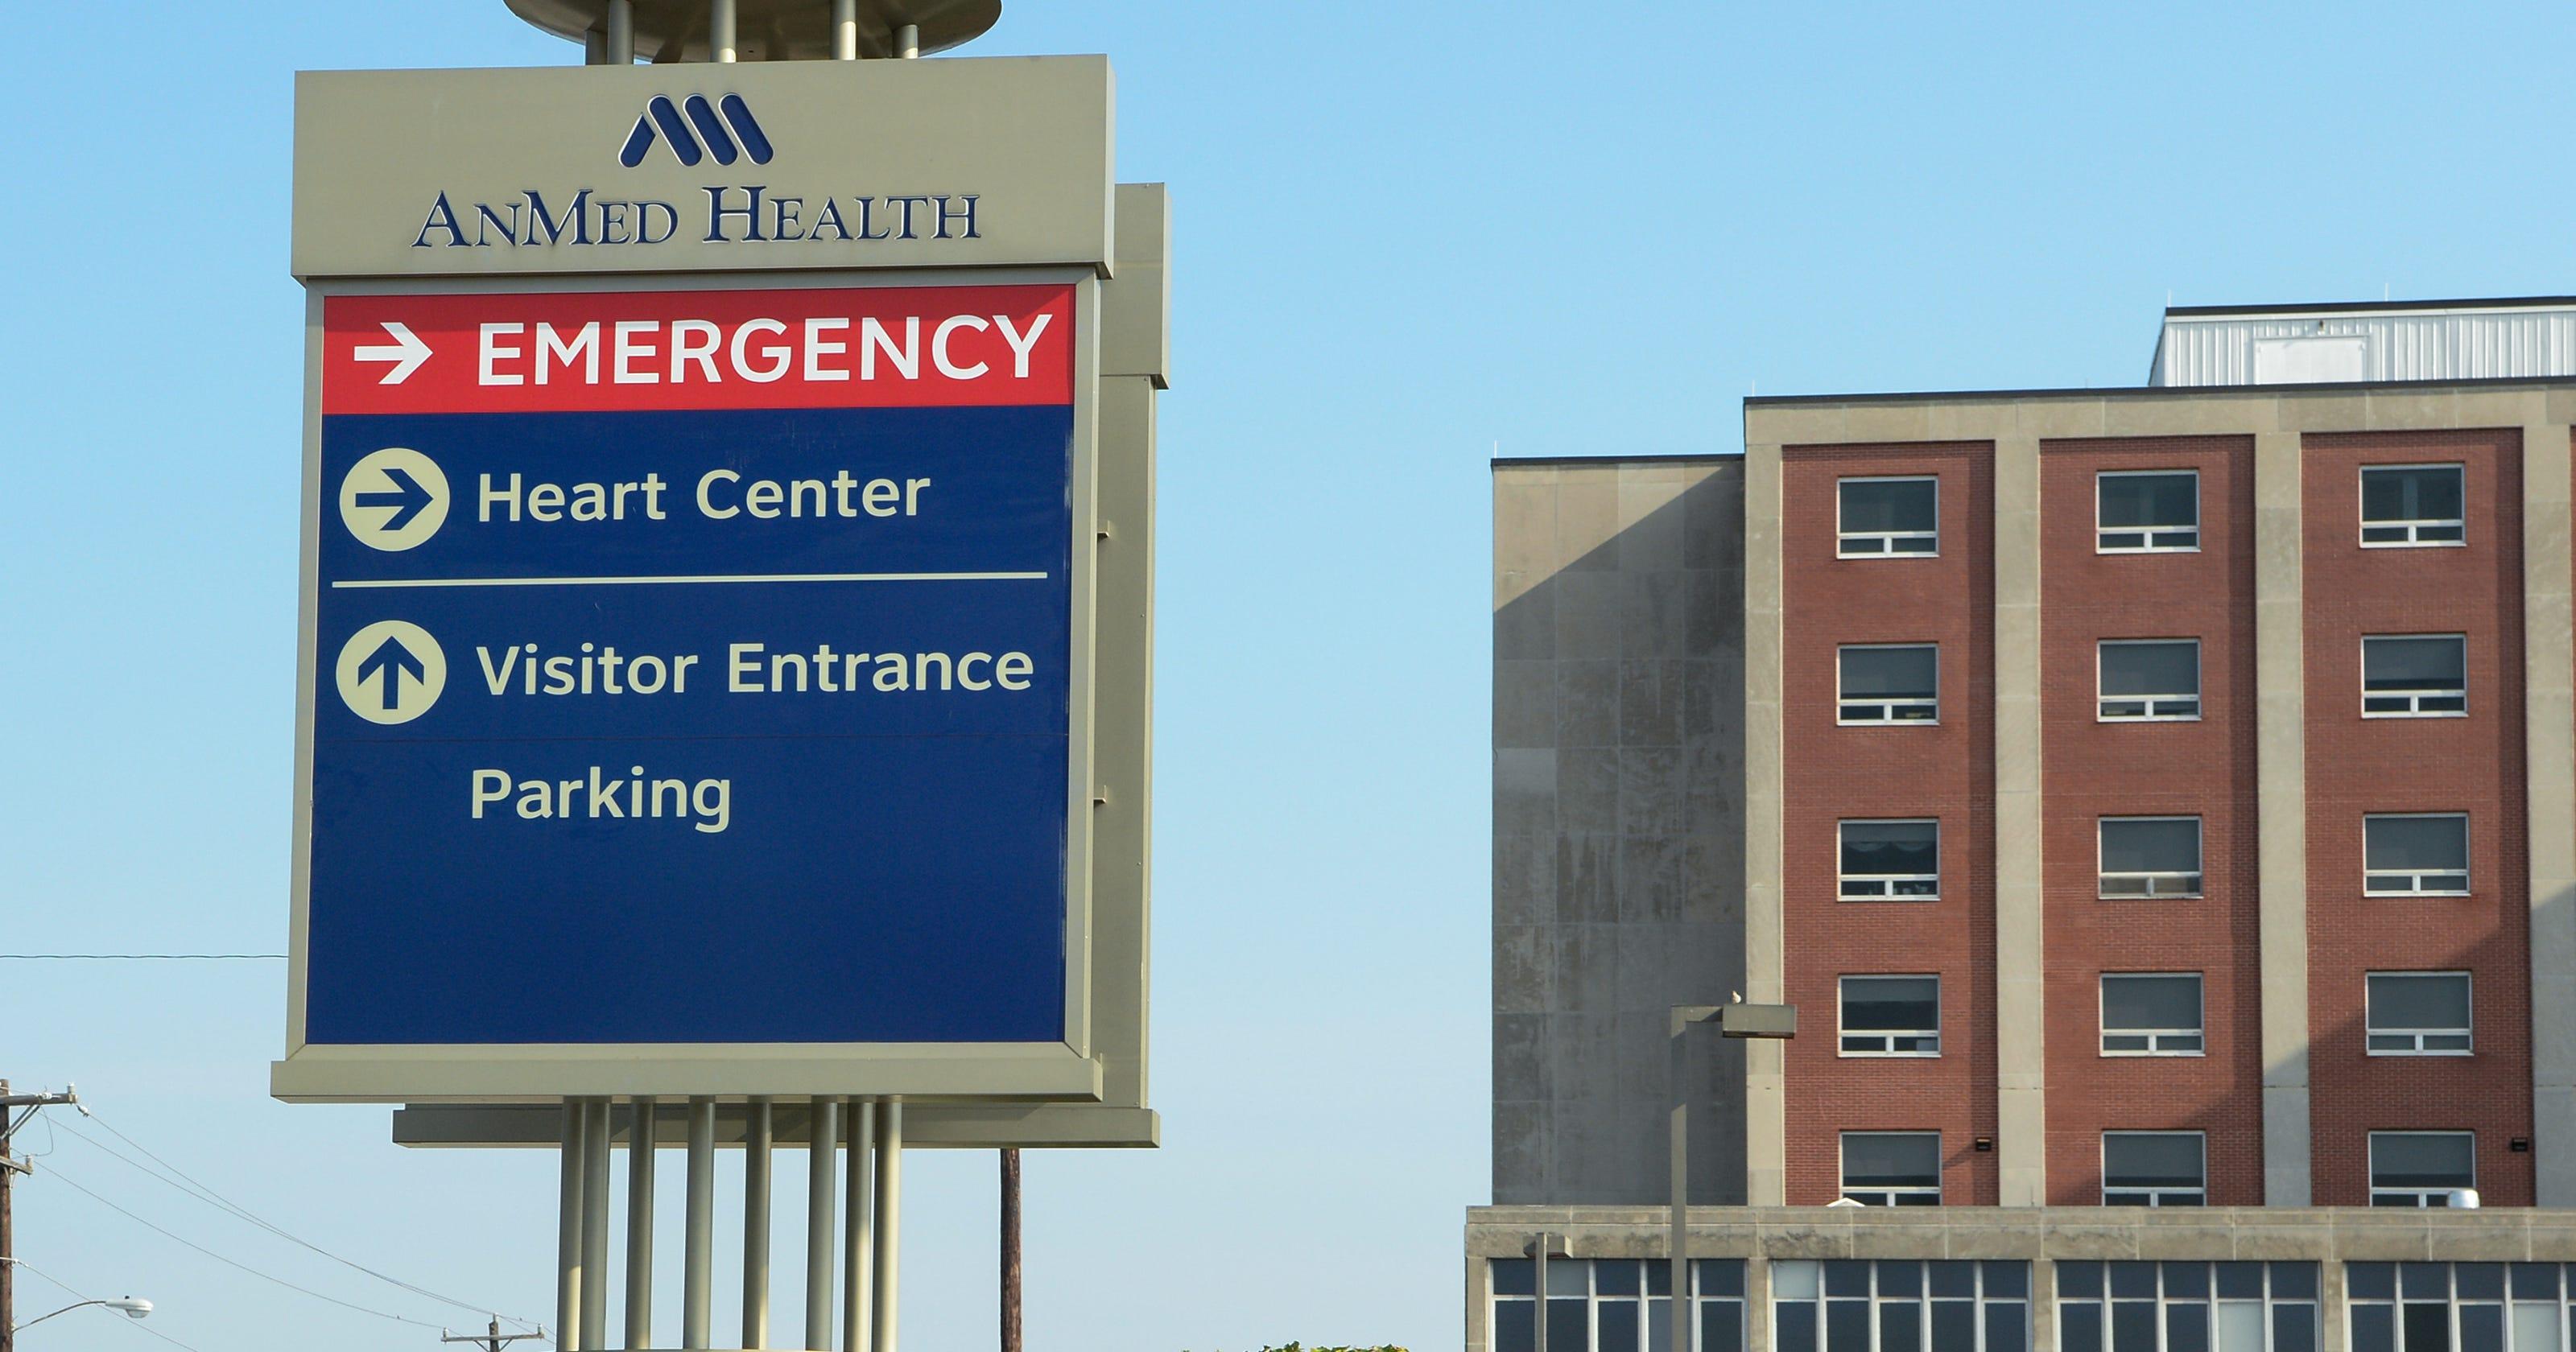 Anmed Health Settles False Medicare Claims Case